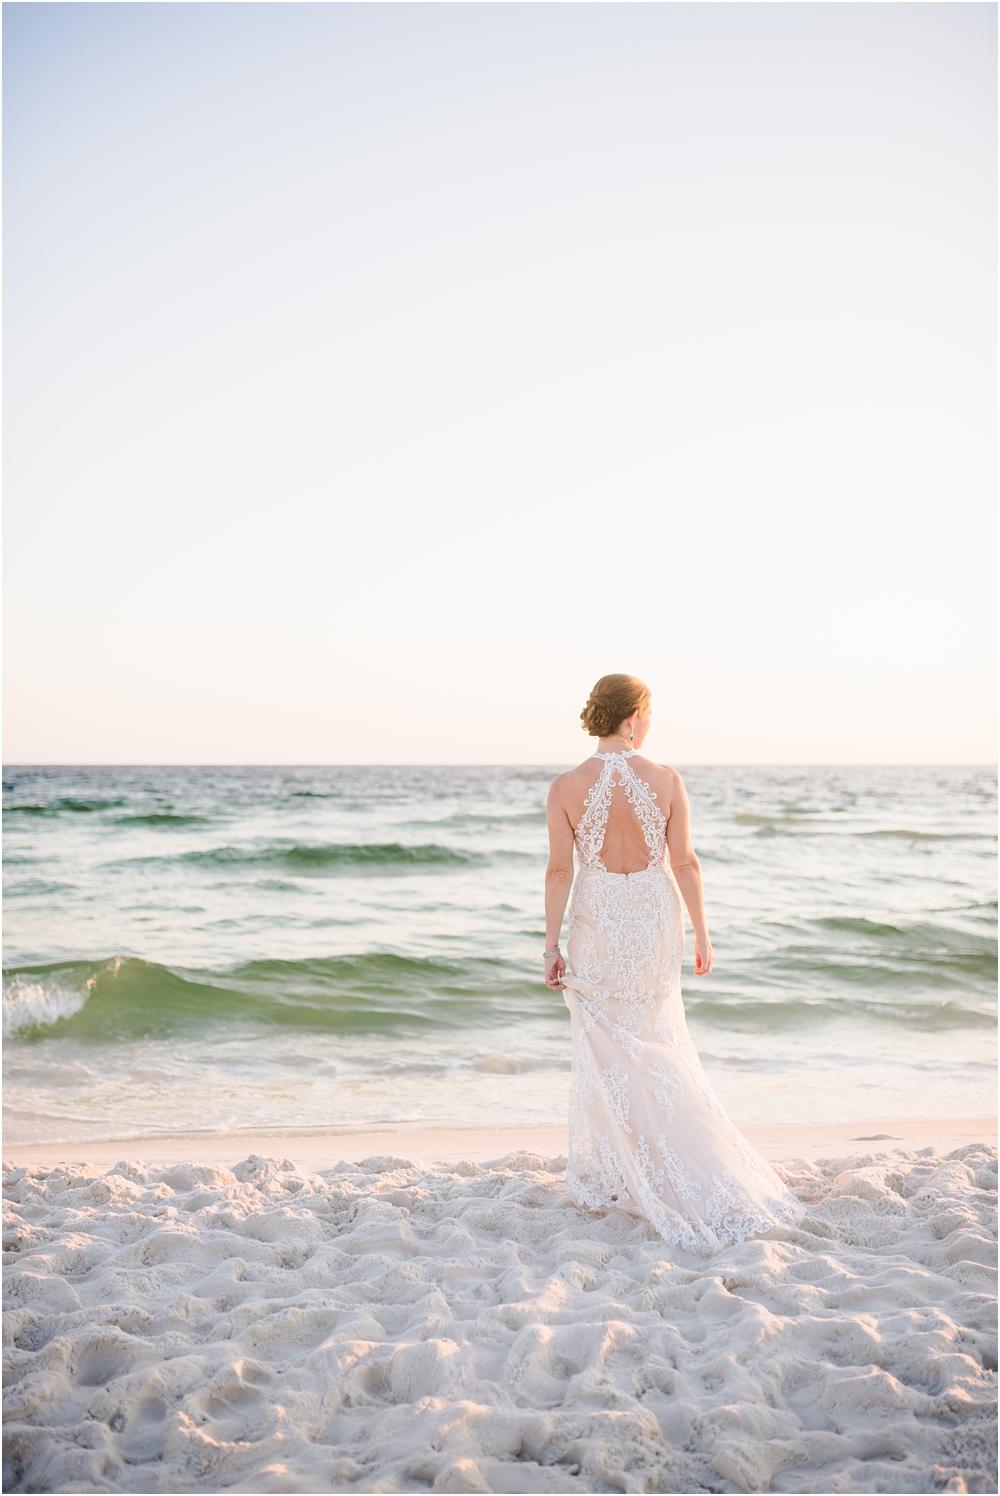 ledman-wedding-kiersten-stevenson-photography-30a-panama-city-beach-dothan-tallahassee-(491-of-763).JPG